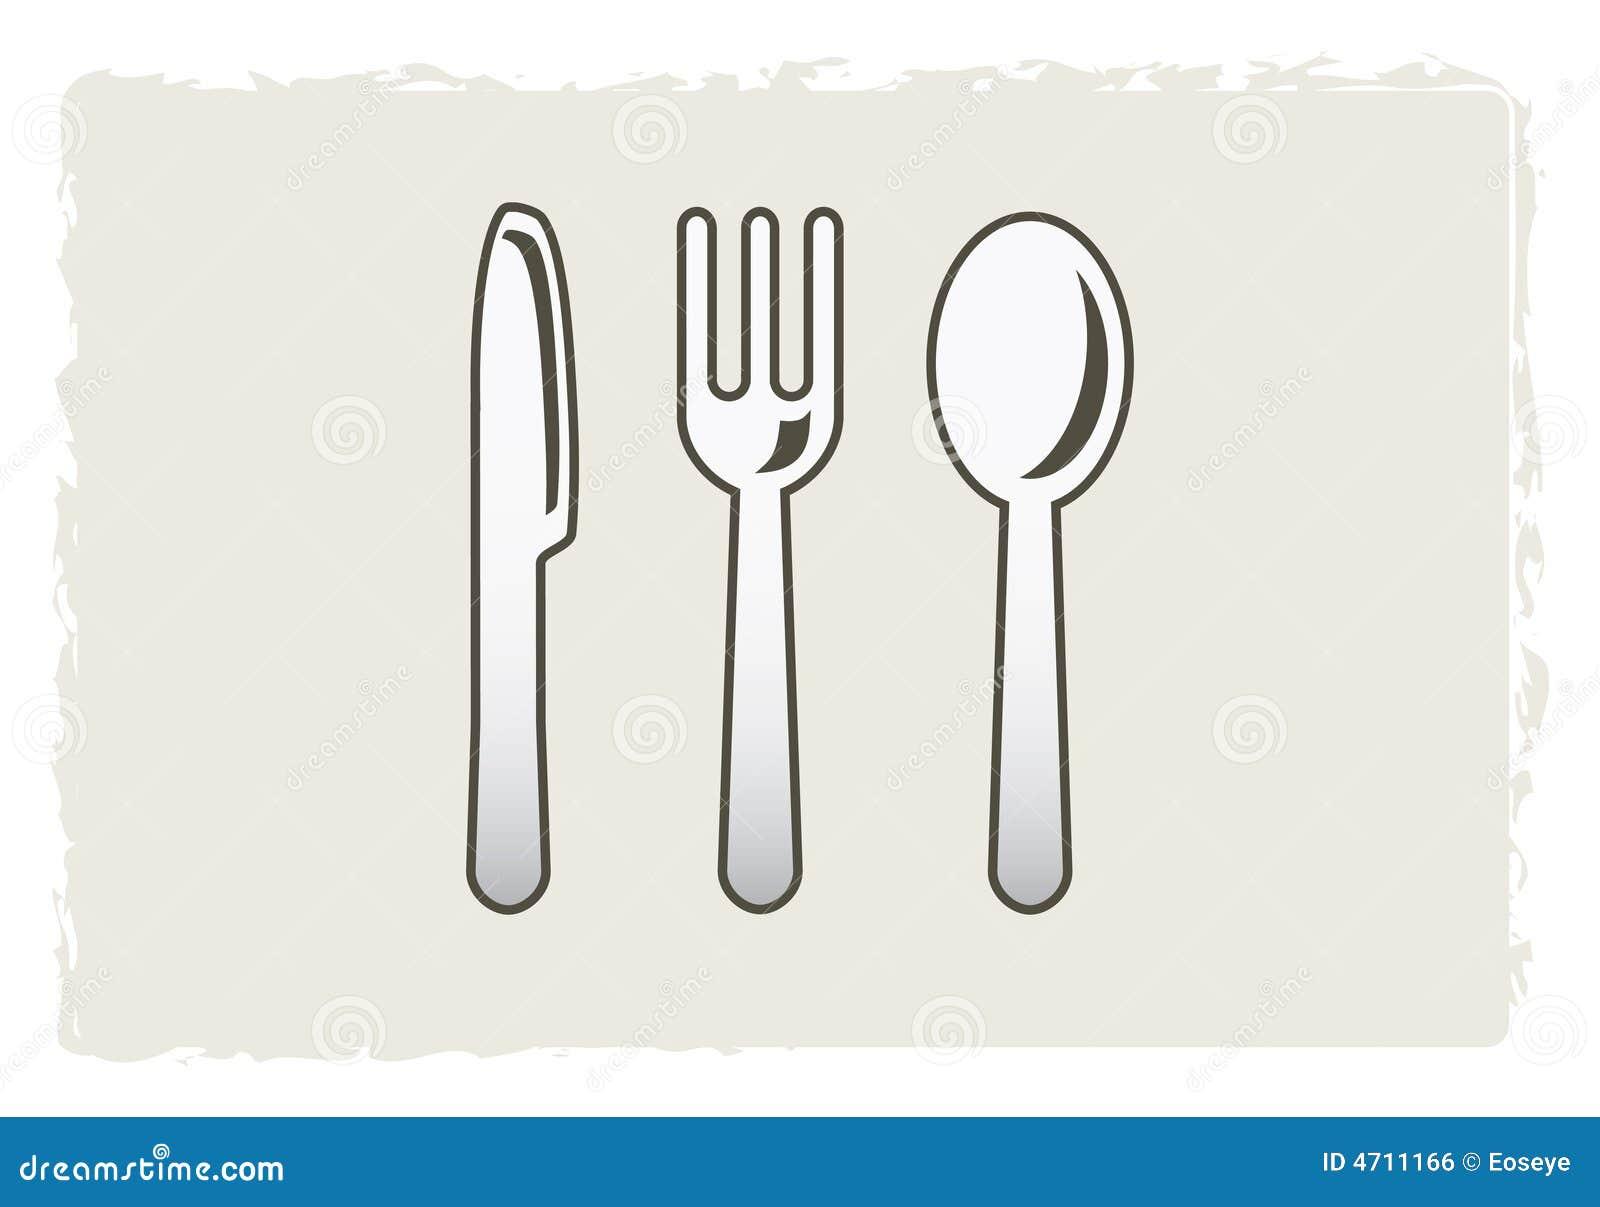 Knife Fork And Spoon Stock Illustration Illustration Of Dinner